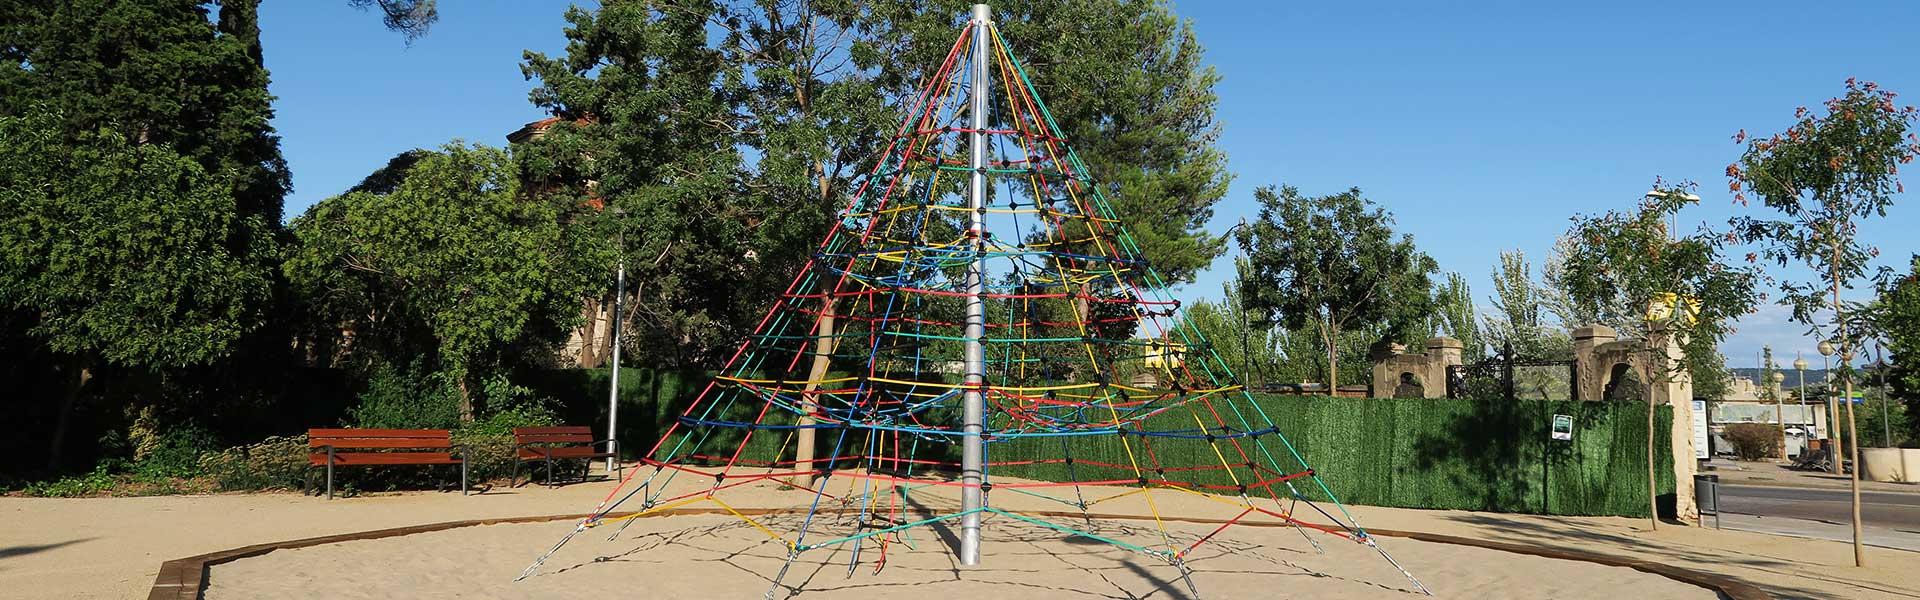 Pirámides de escalada para parques infantiles